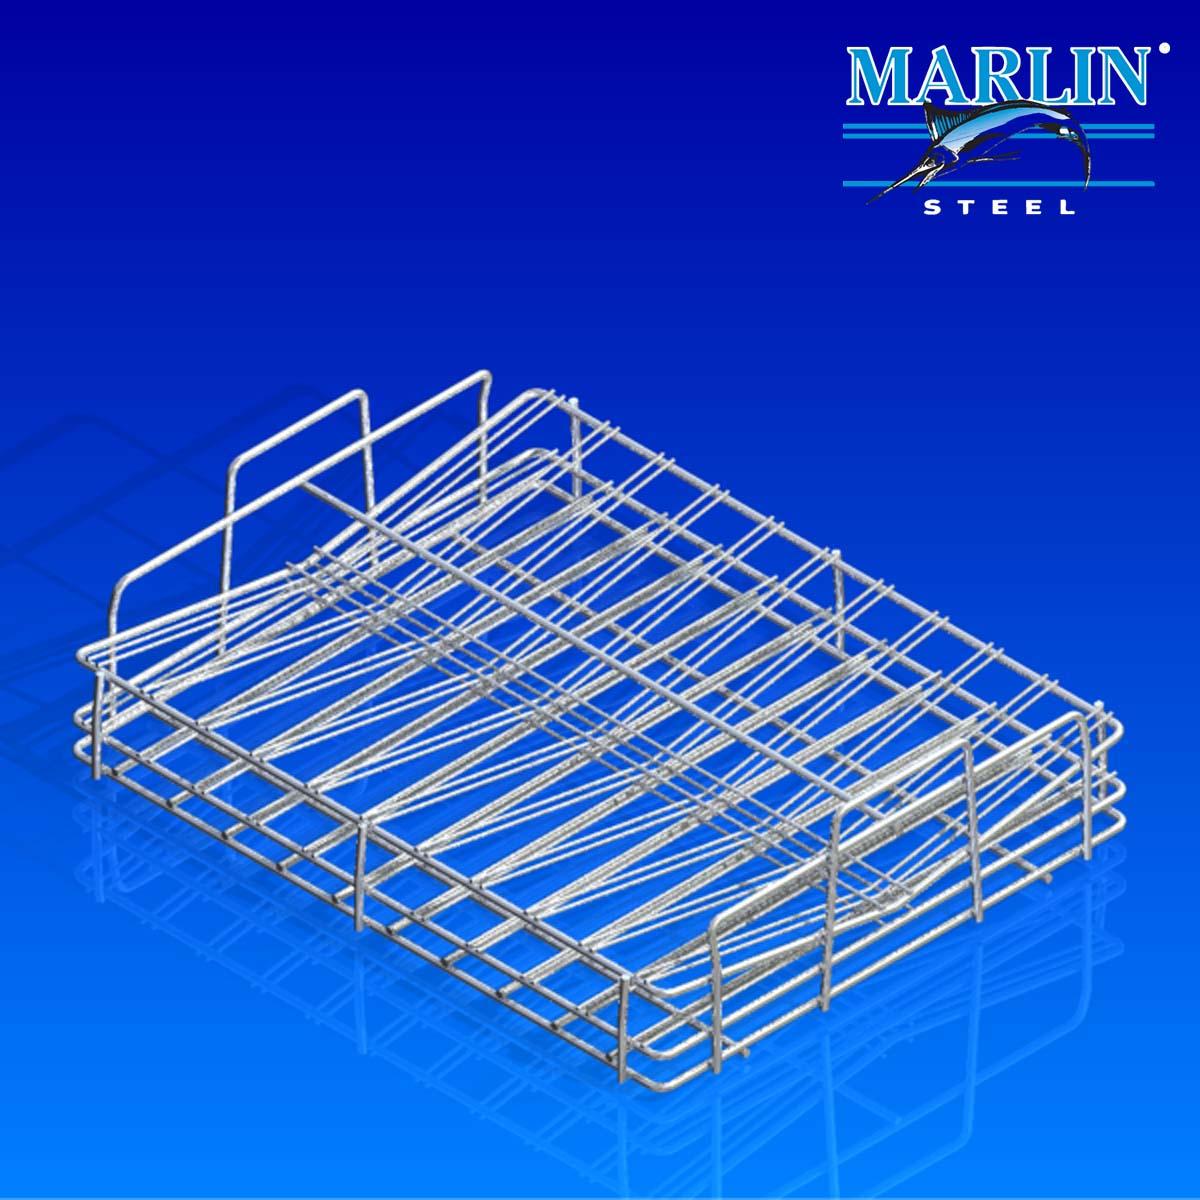 Marlin Steel Wire Basket with Handles 719002.jpg